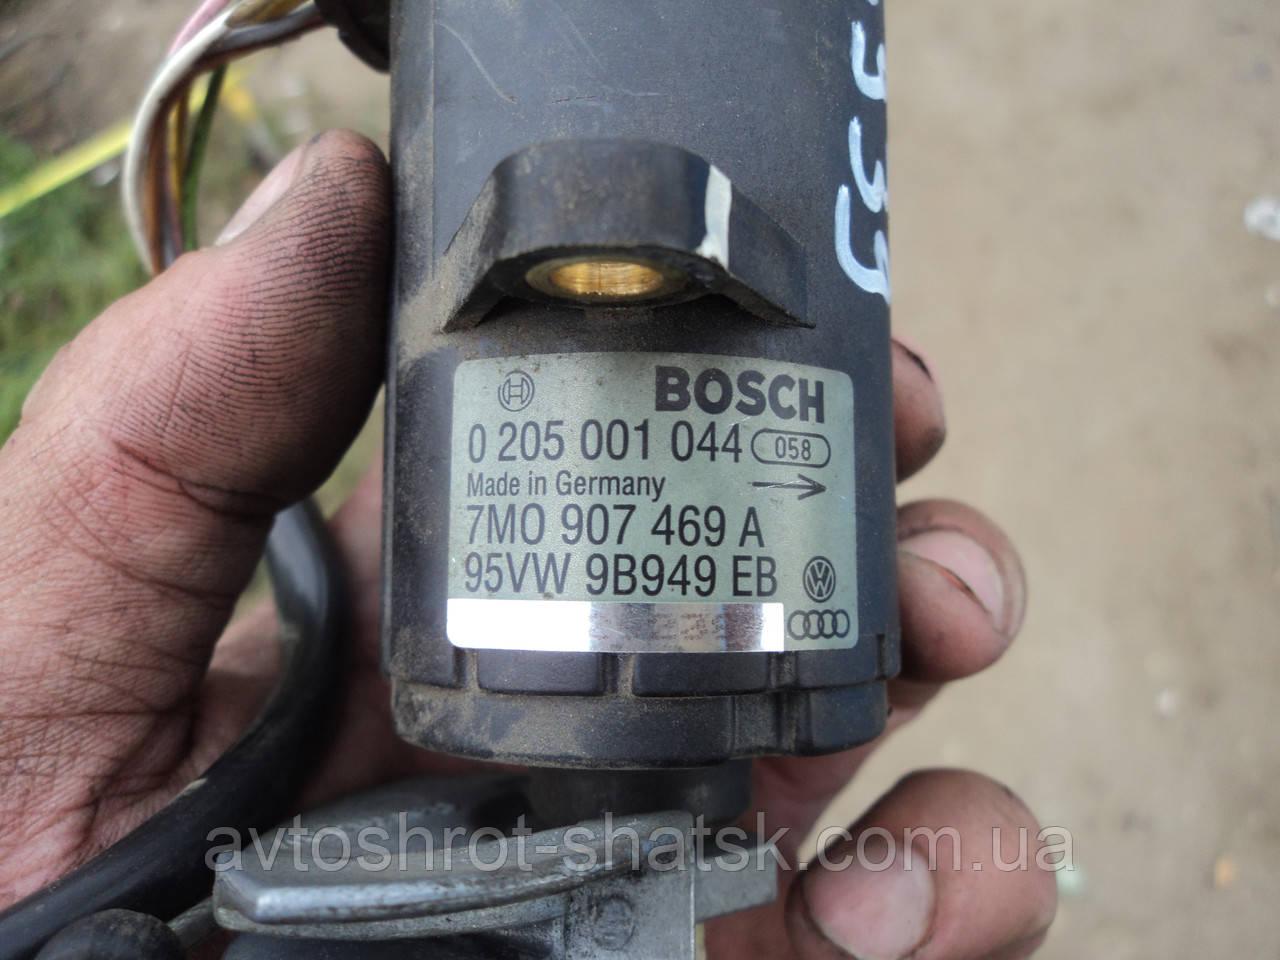 Б/У потенциомер газа  фольцваген шаран 1.0205001044